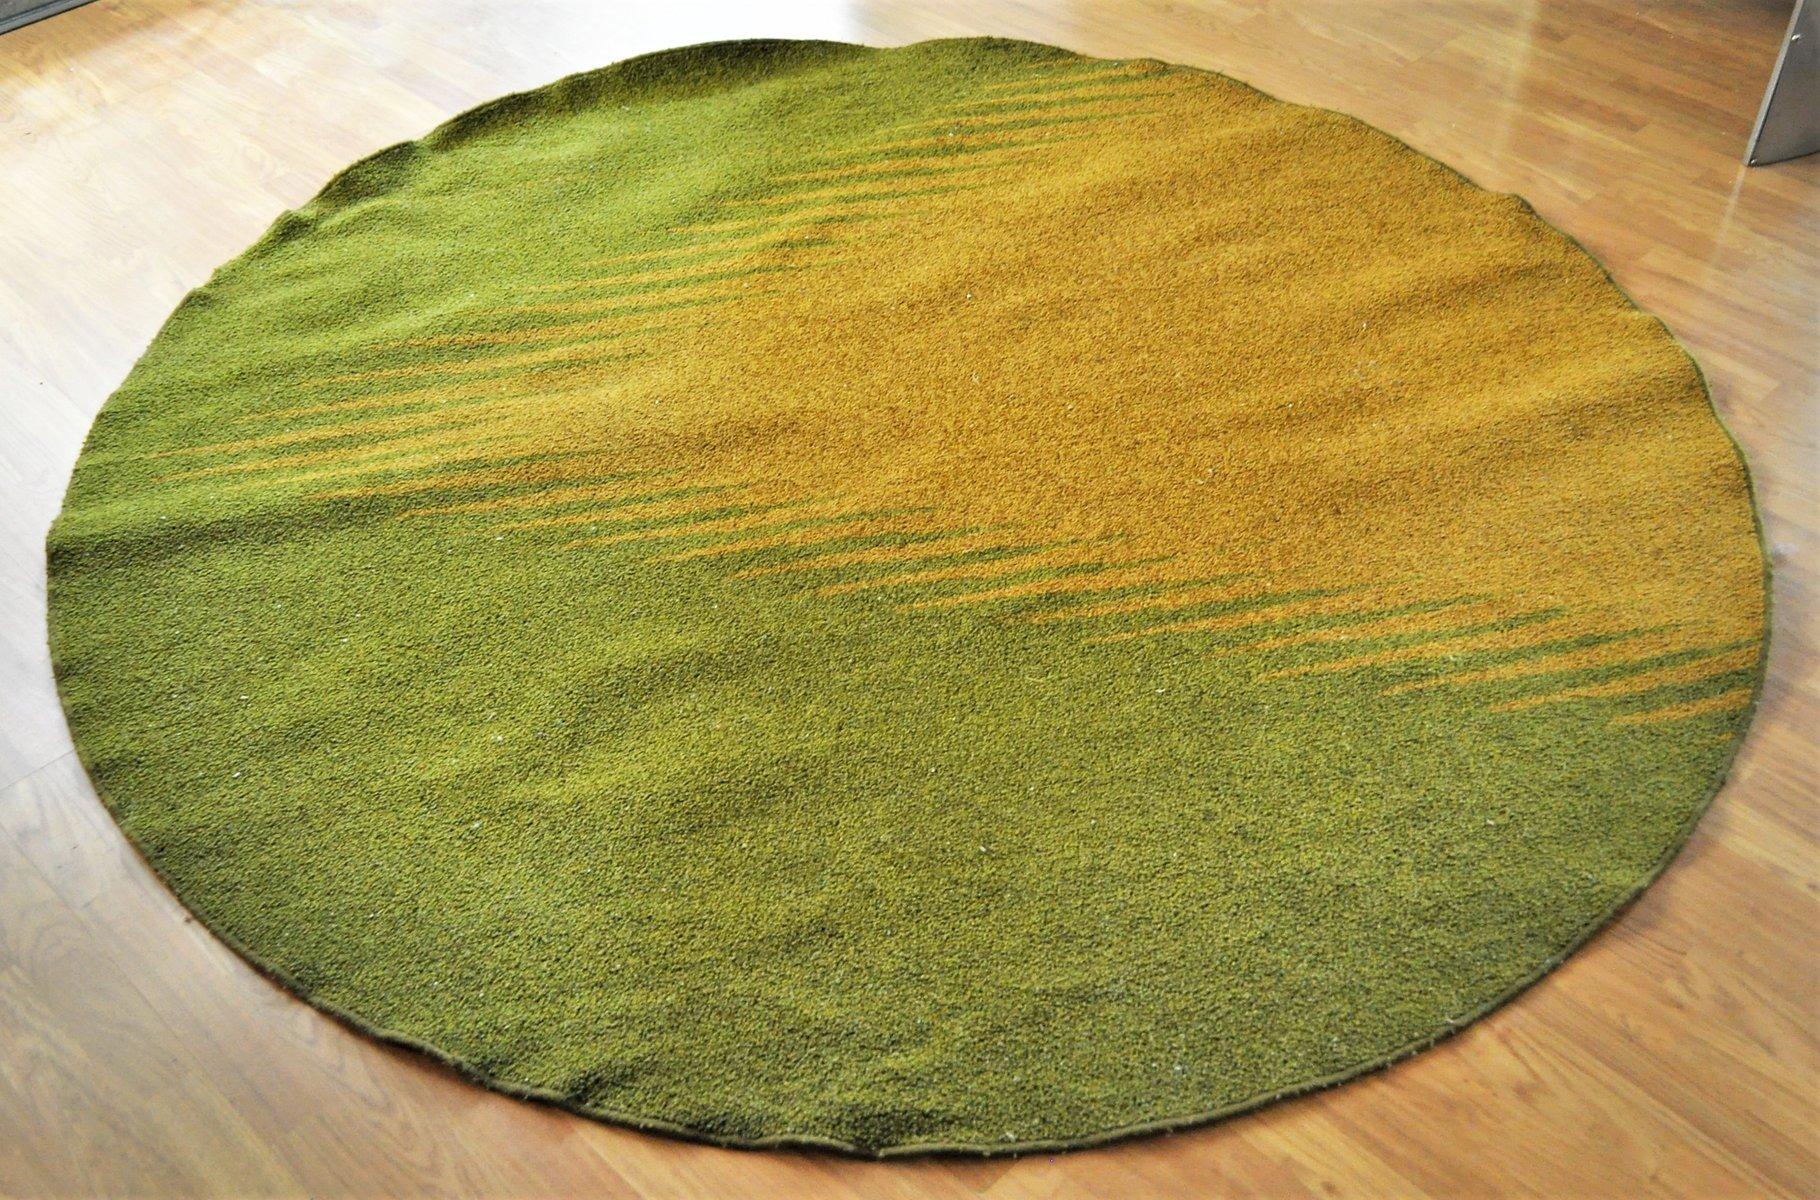 vintage teppich mit opticon muster bei pamono kaufen. Black Bedroom Furniture Sets. Home Design Ideas